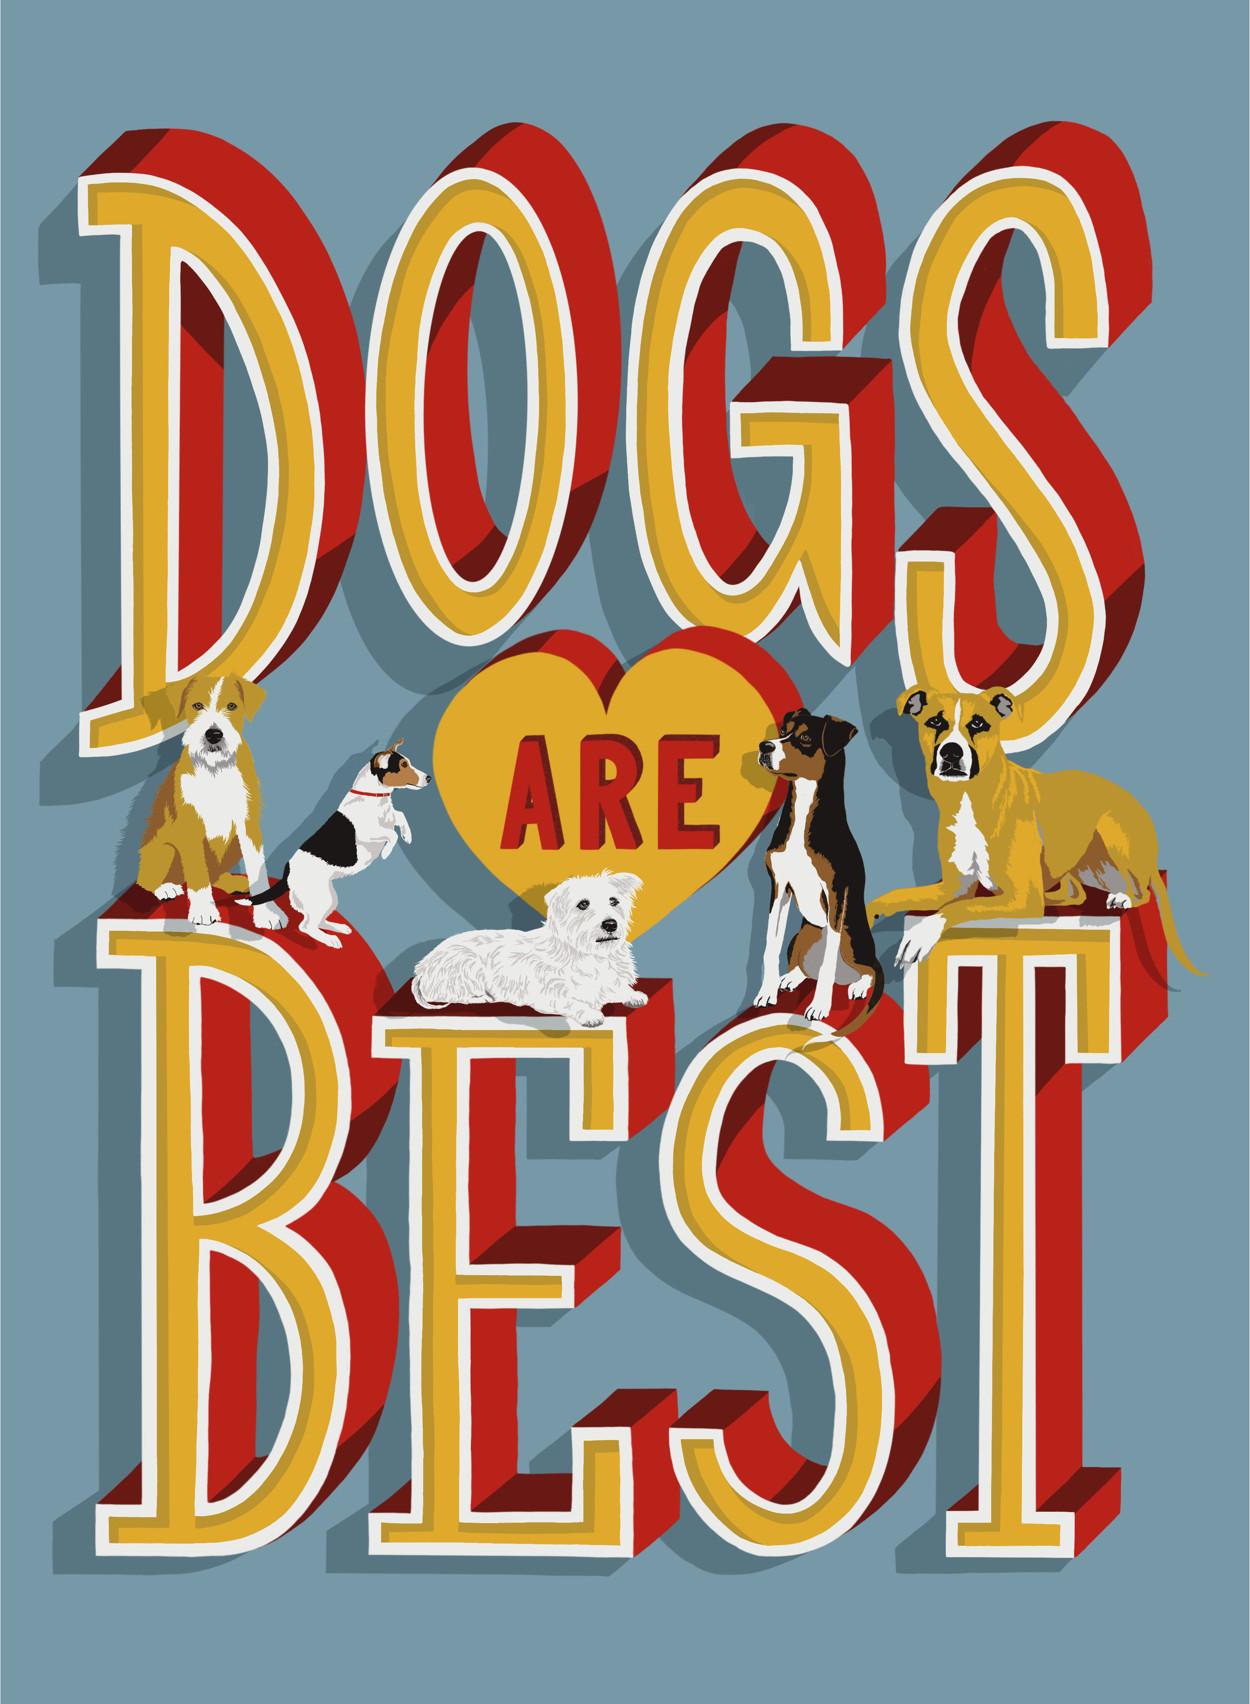 Dogs Are Best Fine Art Print